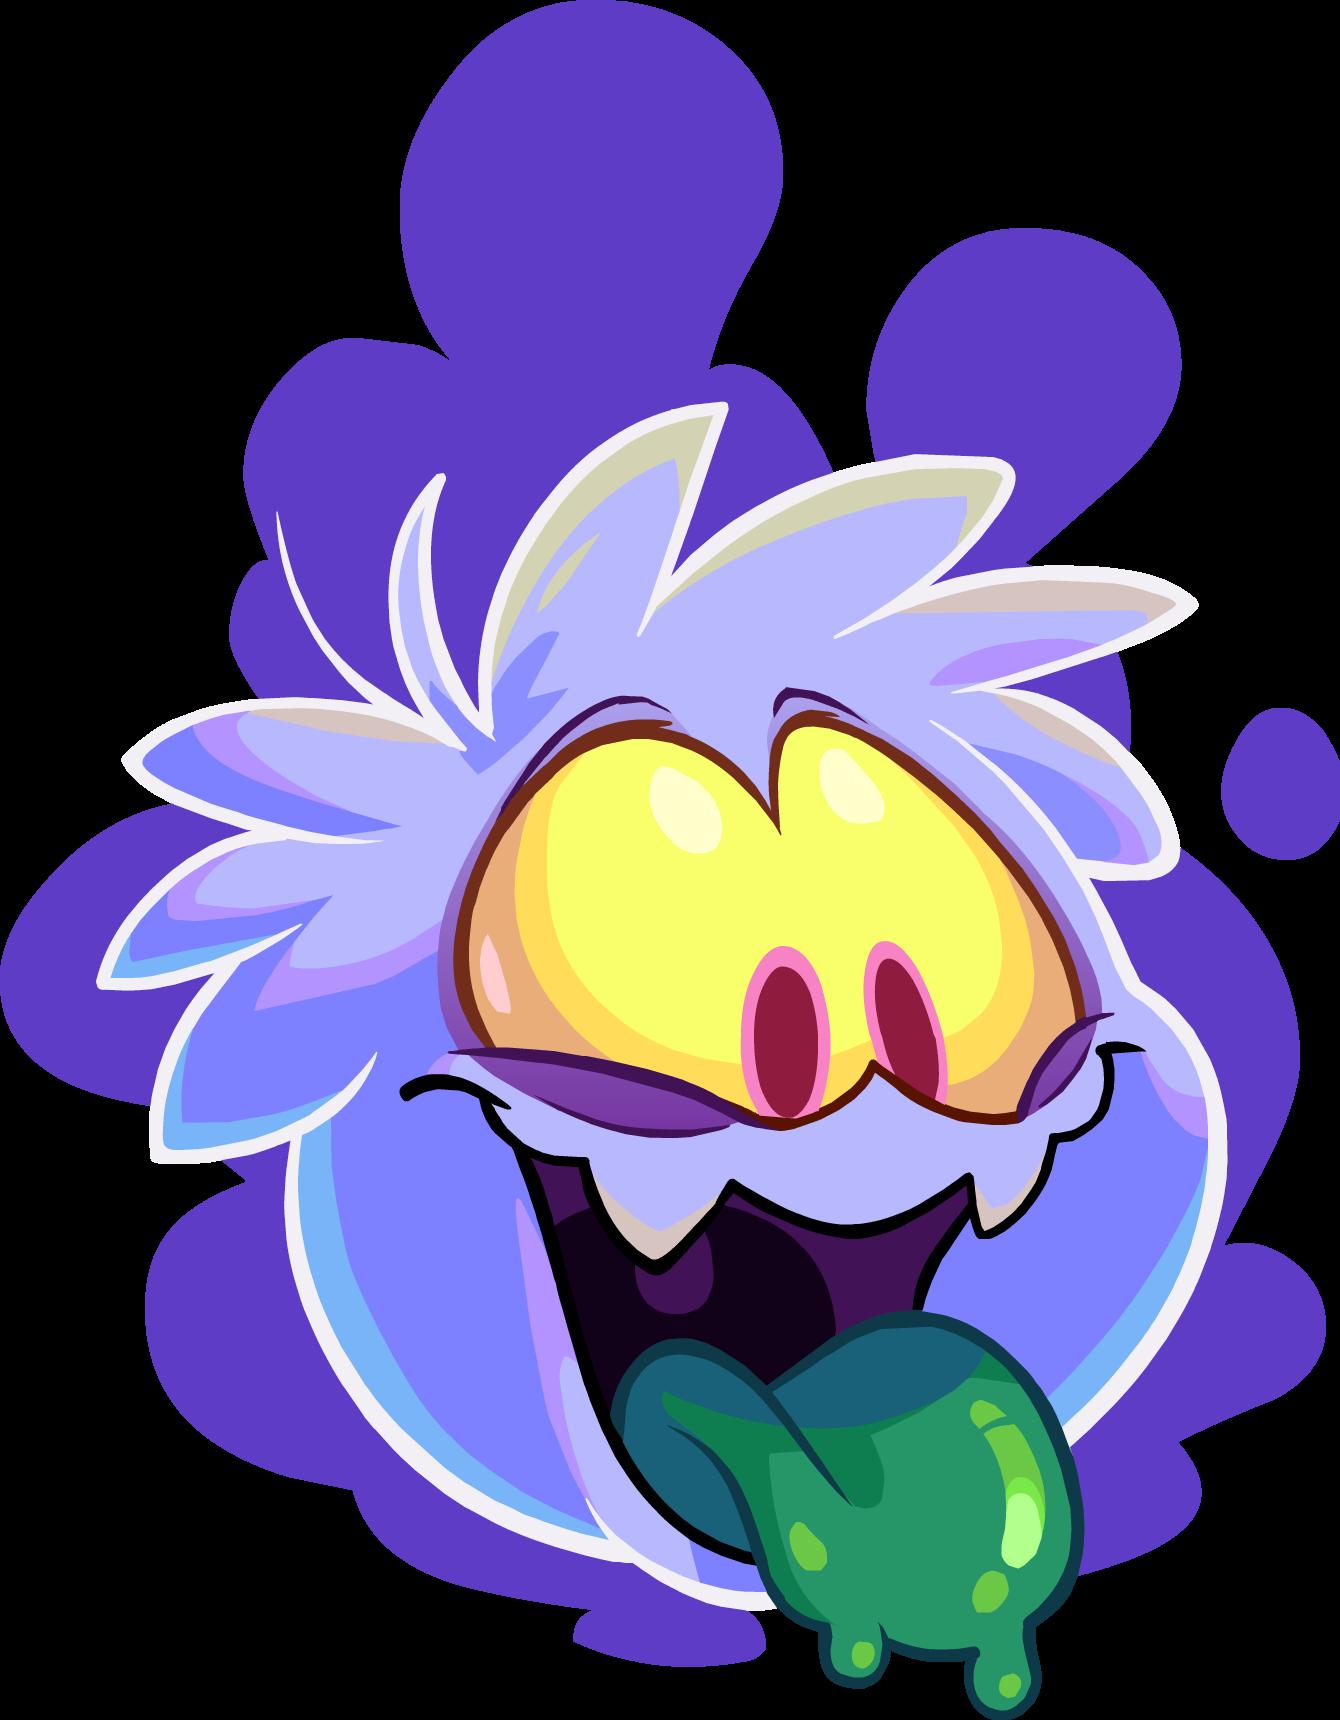 Puffle Fantasmagórico